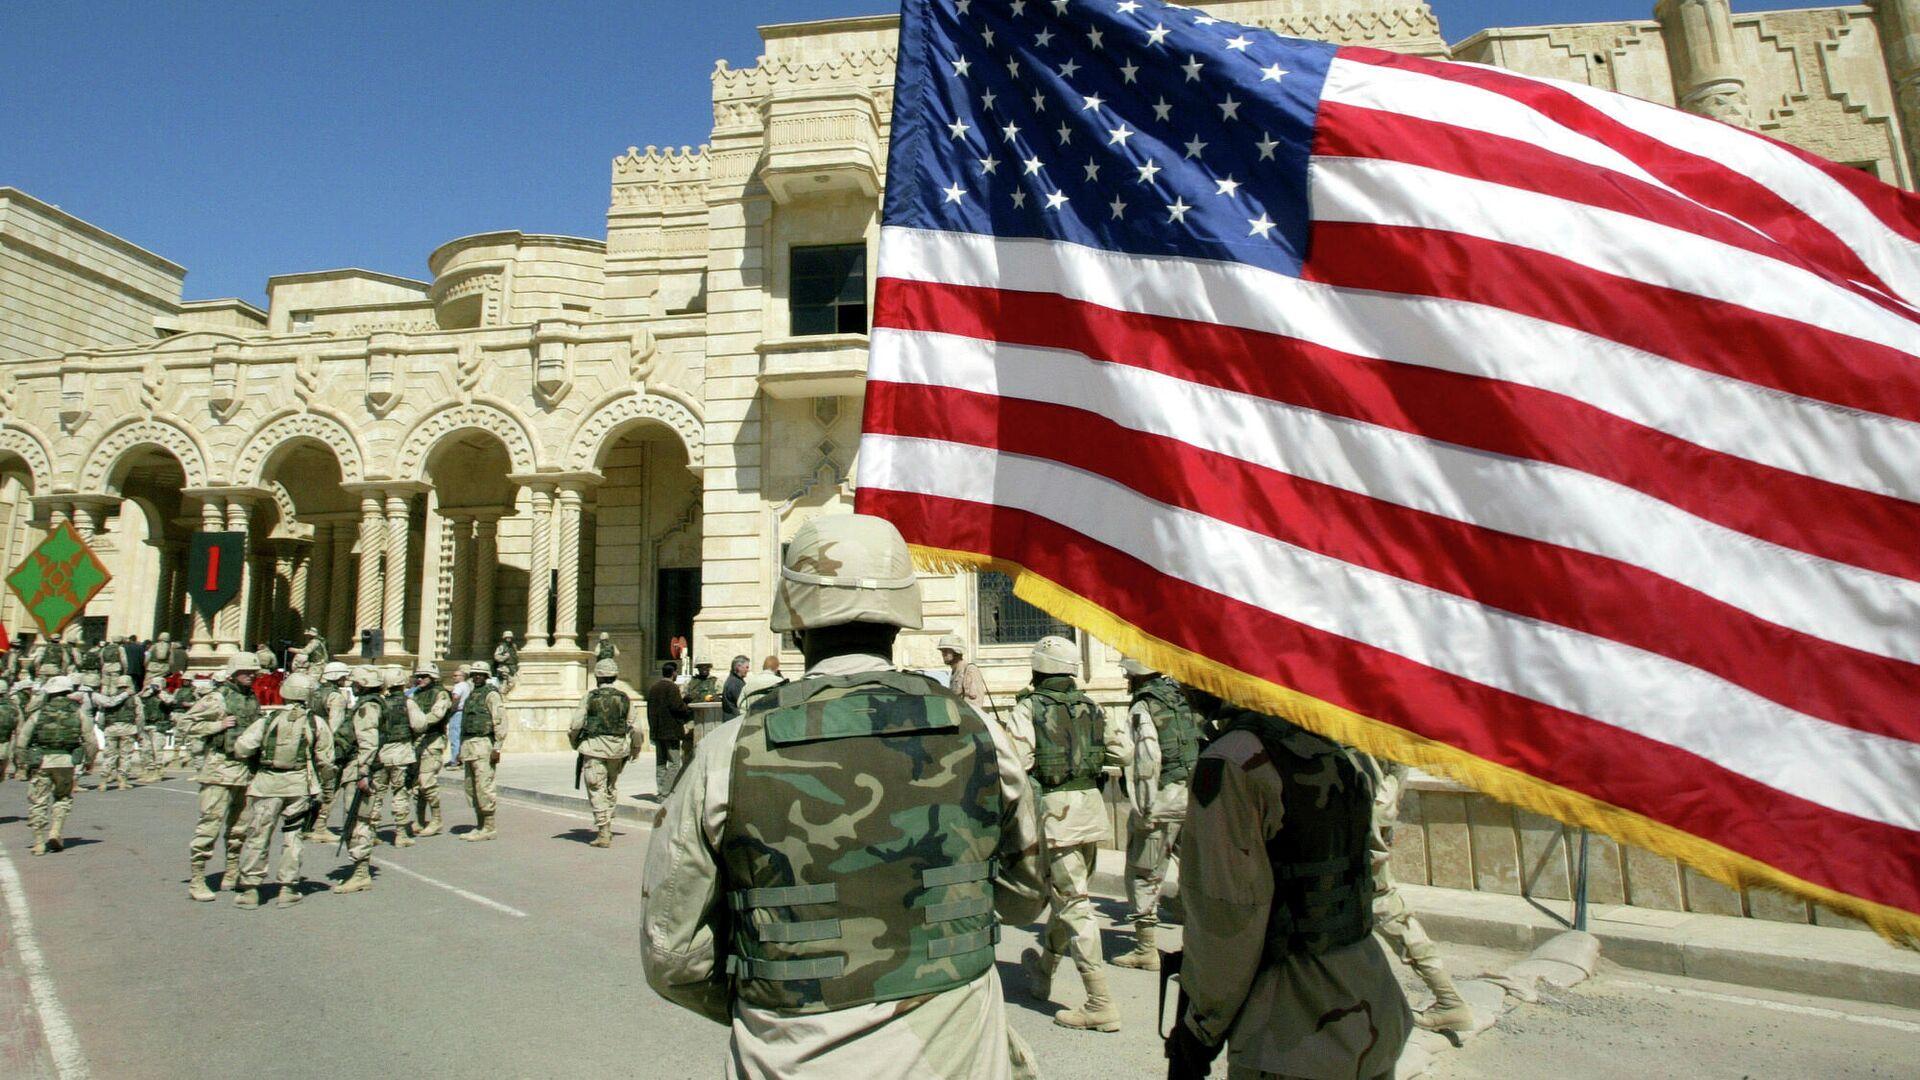 Американский солдат идет с флагом США, Багдад, Ирак - РИА Новости, 1920, 11.09.2021